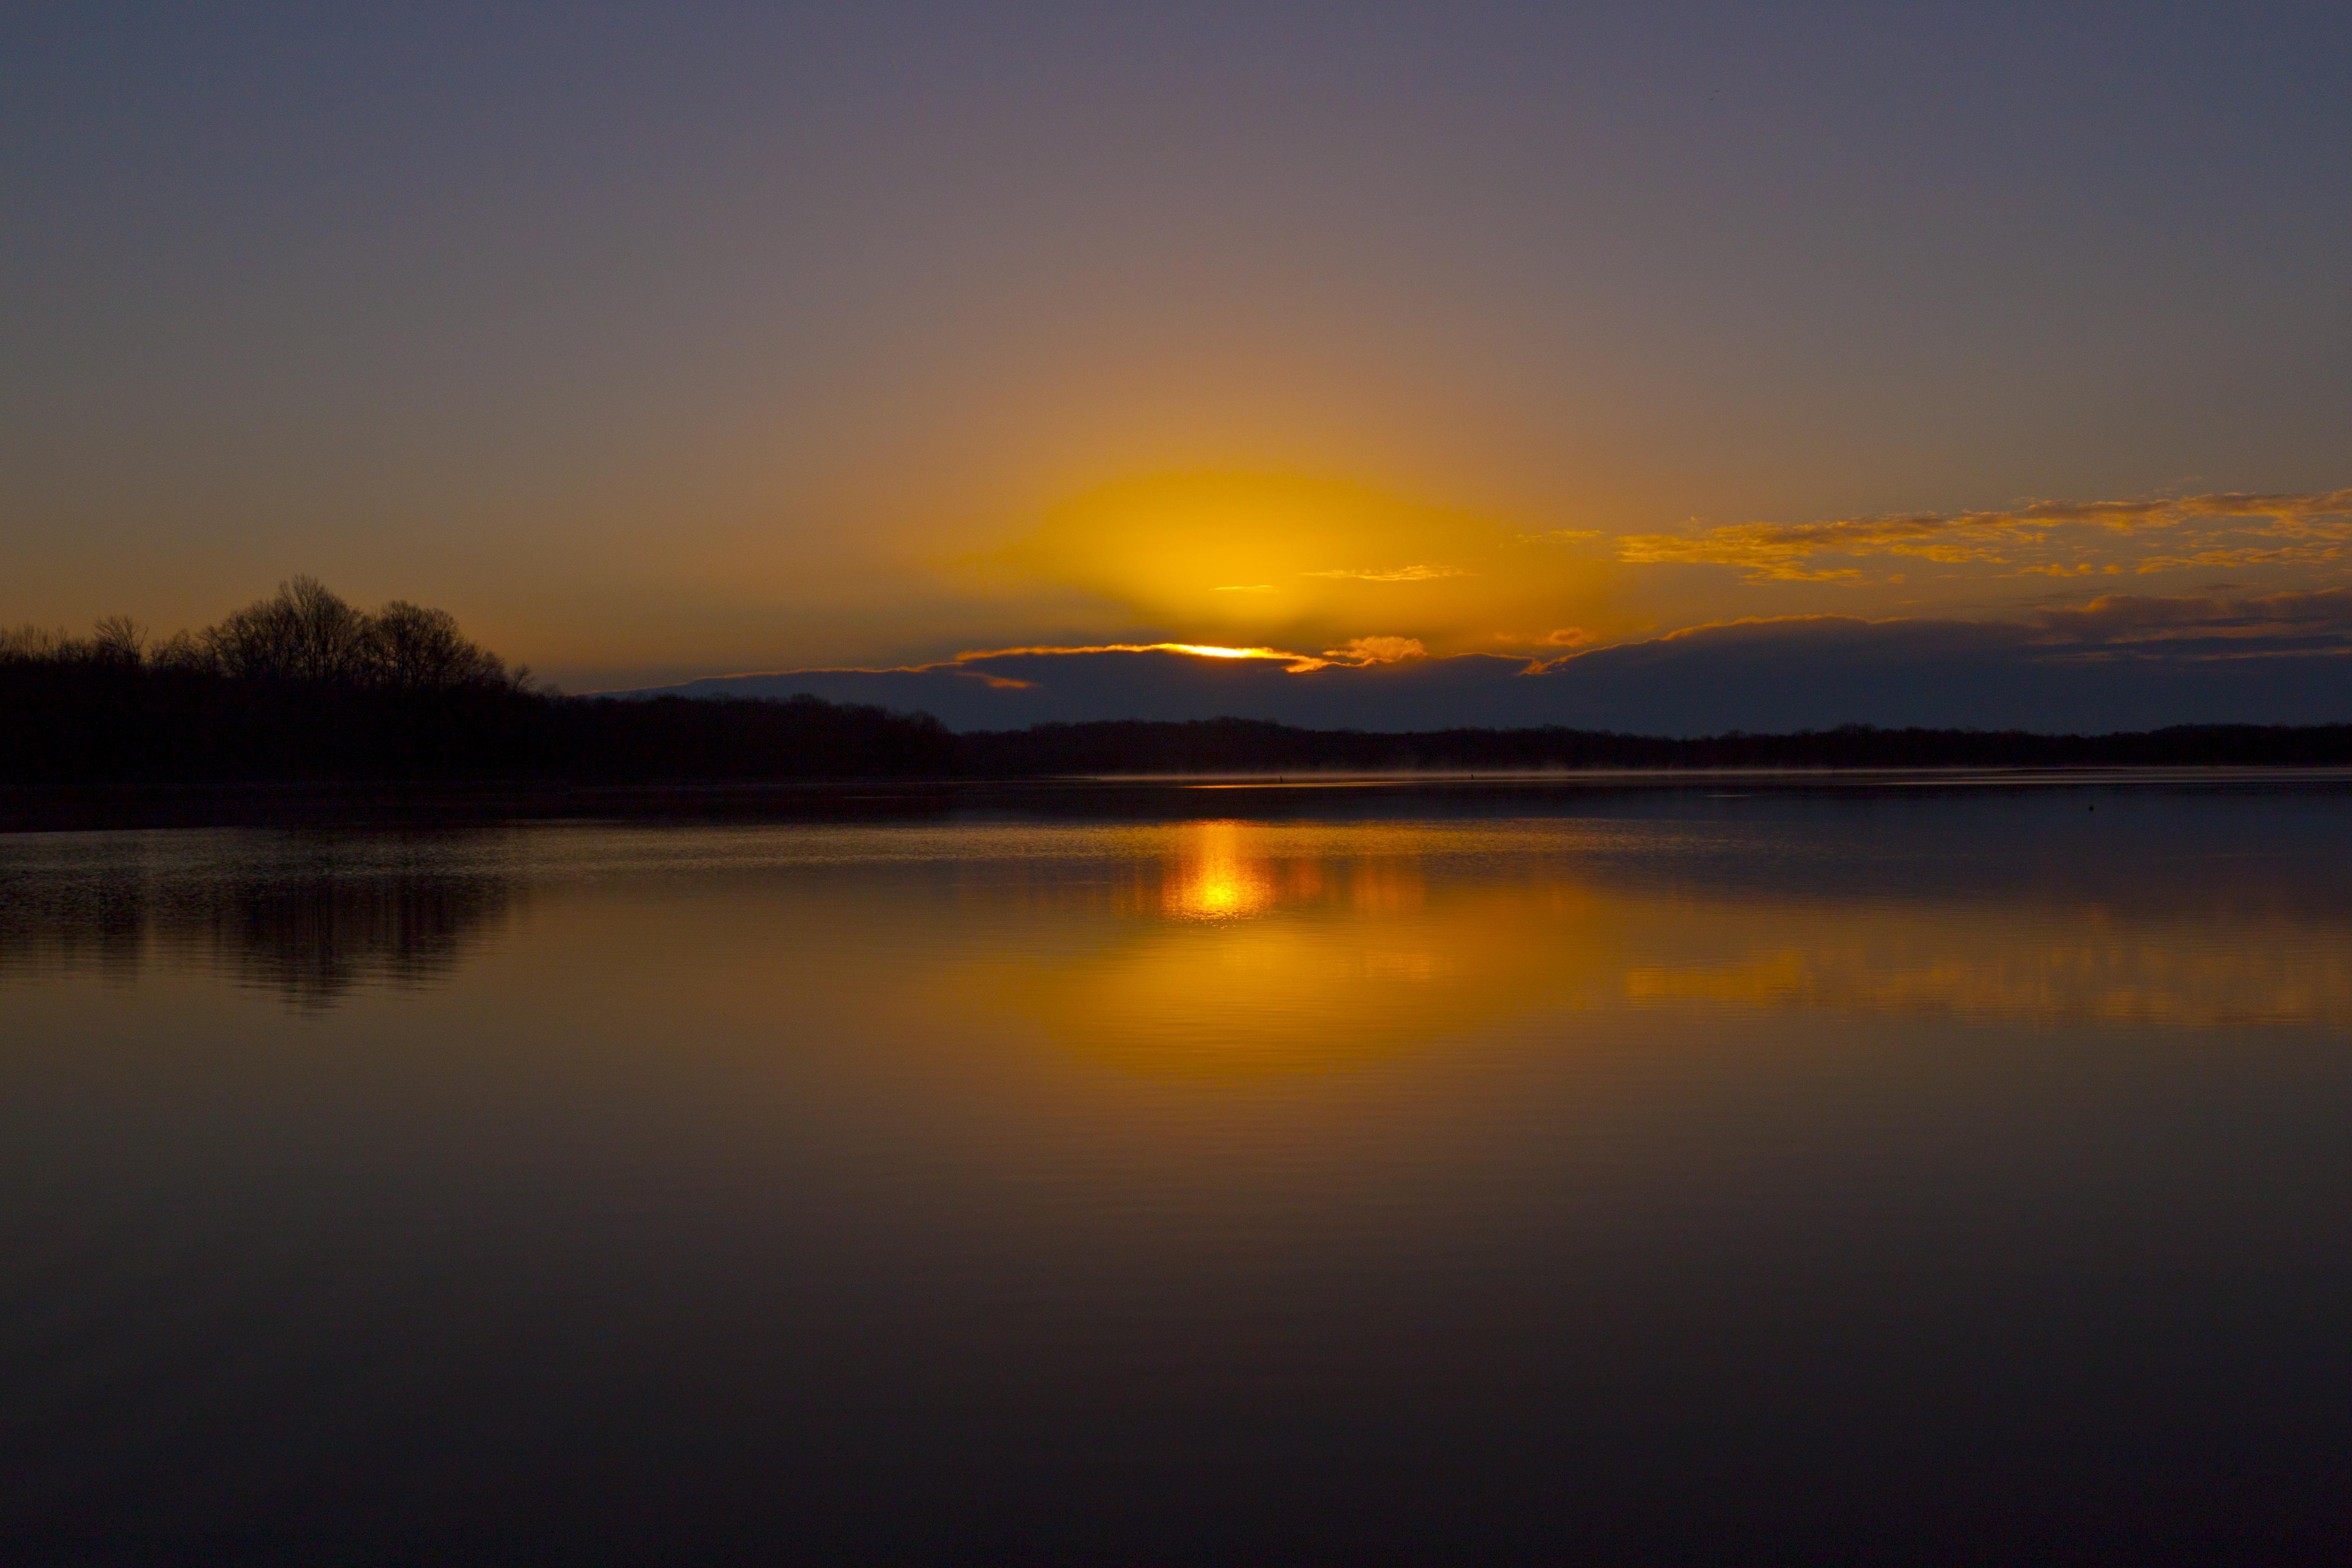 Wisdom Way, Smyrna, TN, USA Sunrise Sunset Times